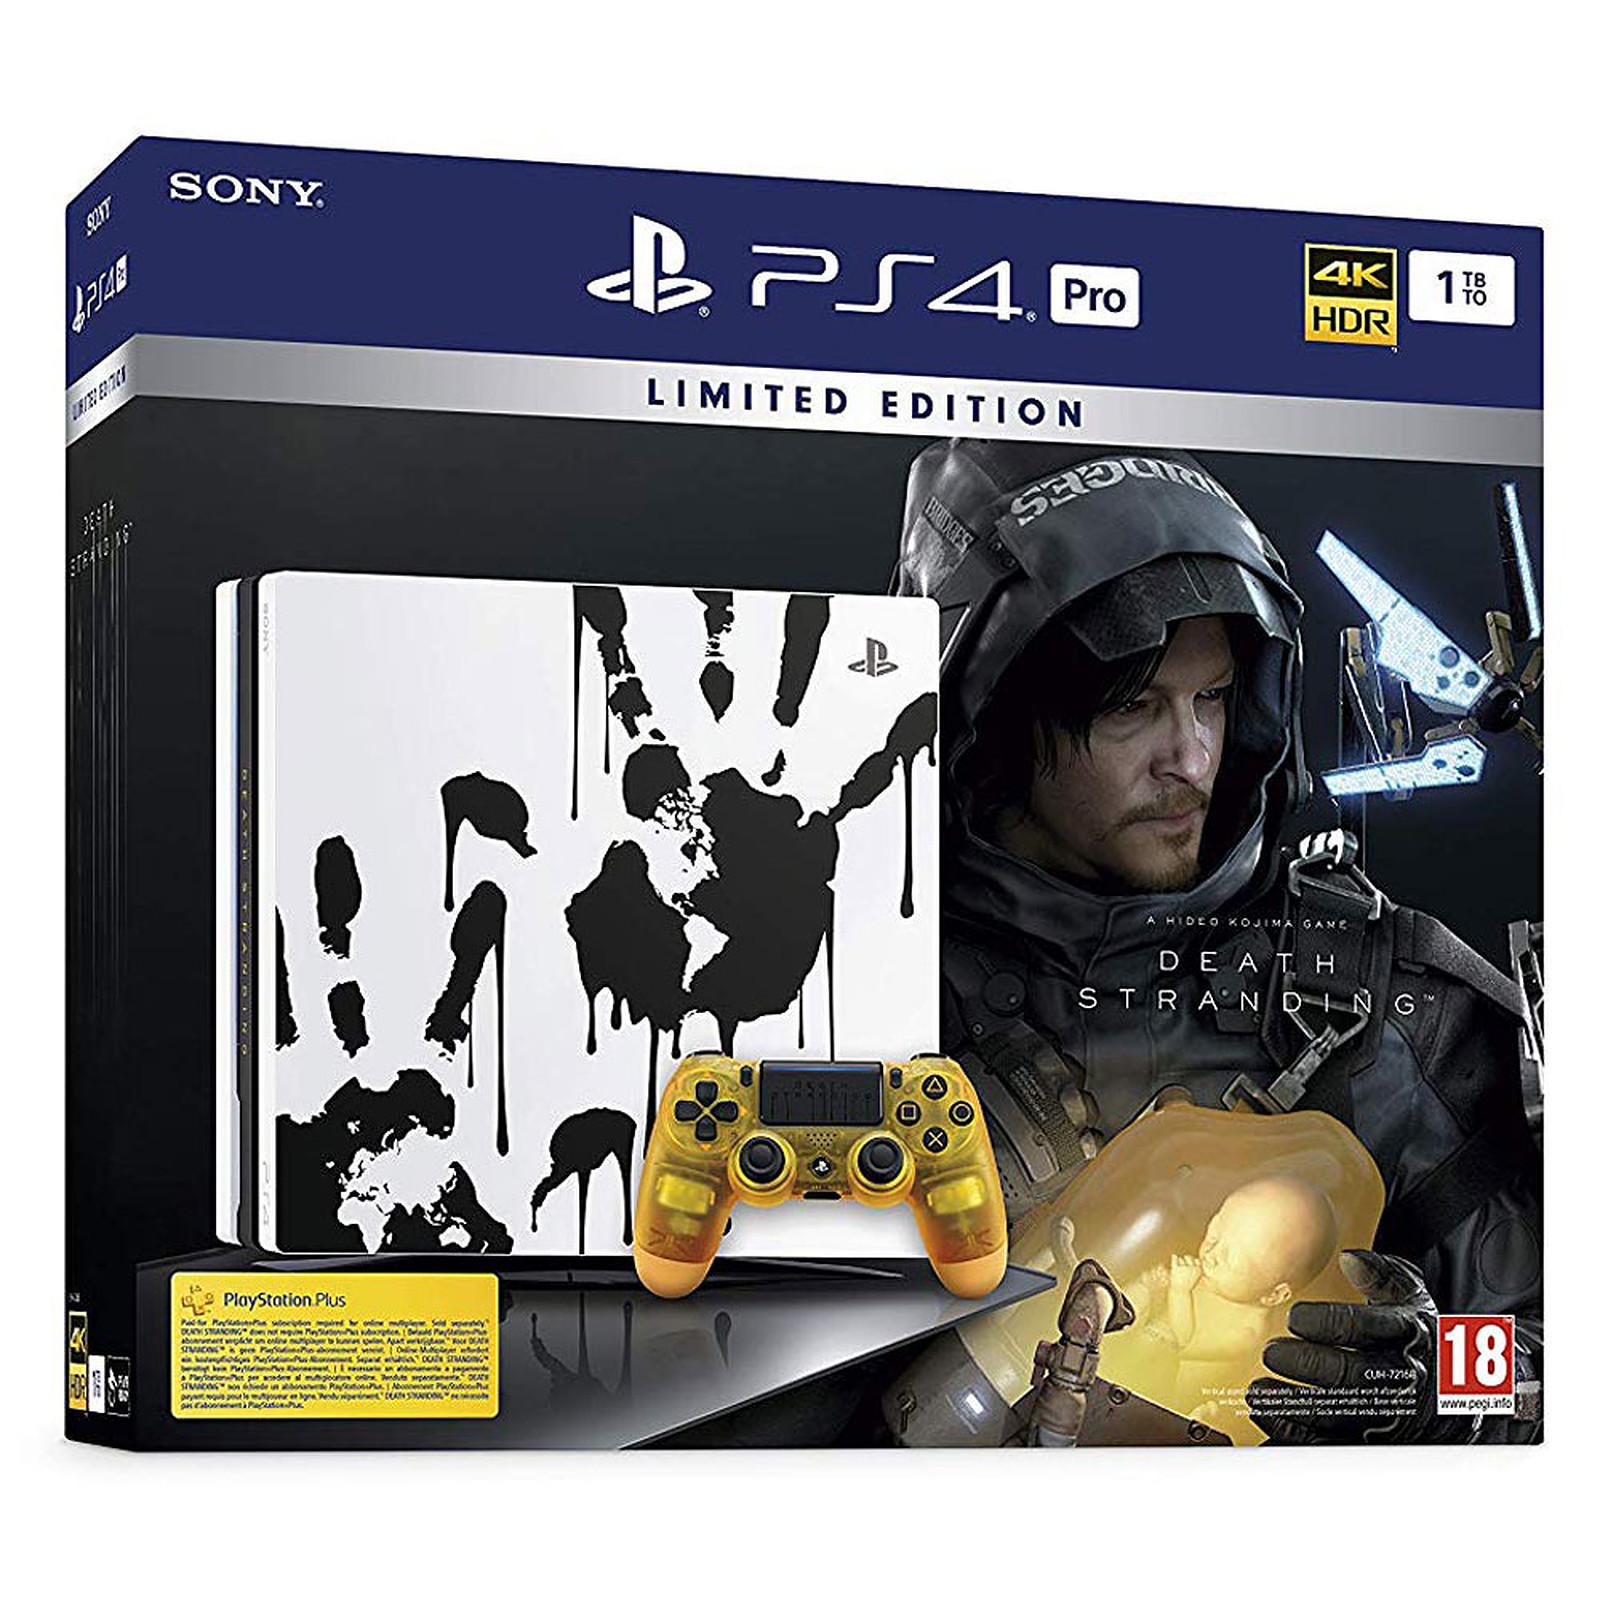 Sony PlayStation 4 Pro (1TB) - Death Stranding Limited Edition